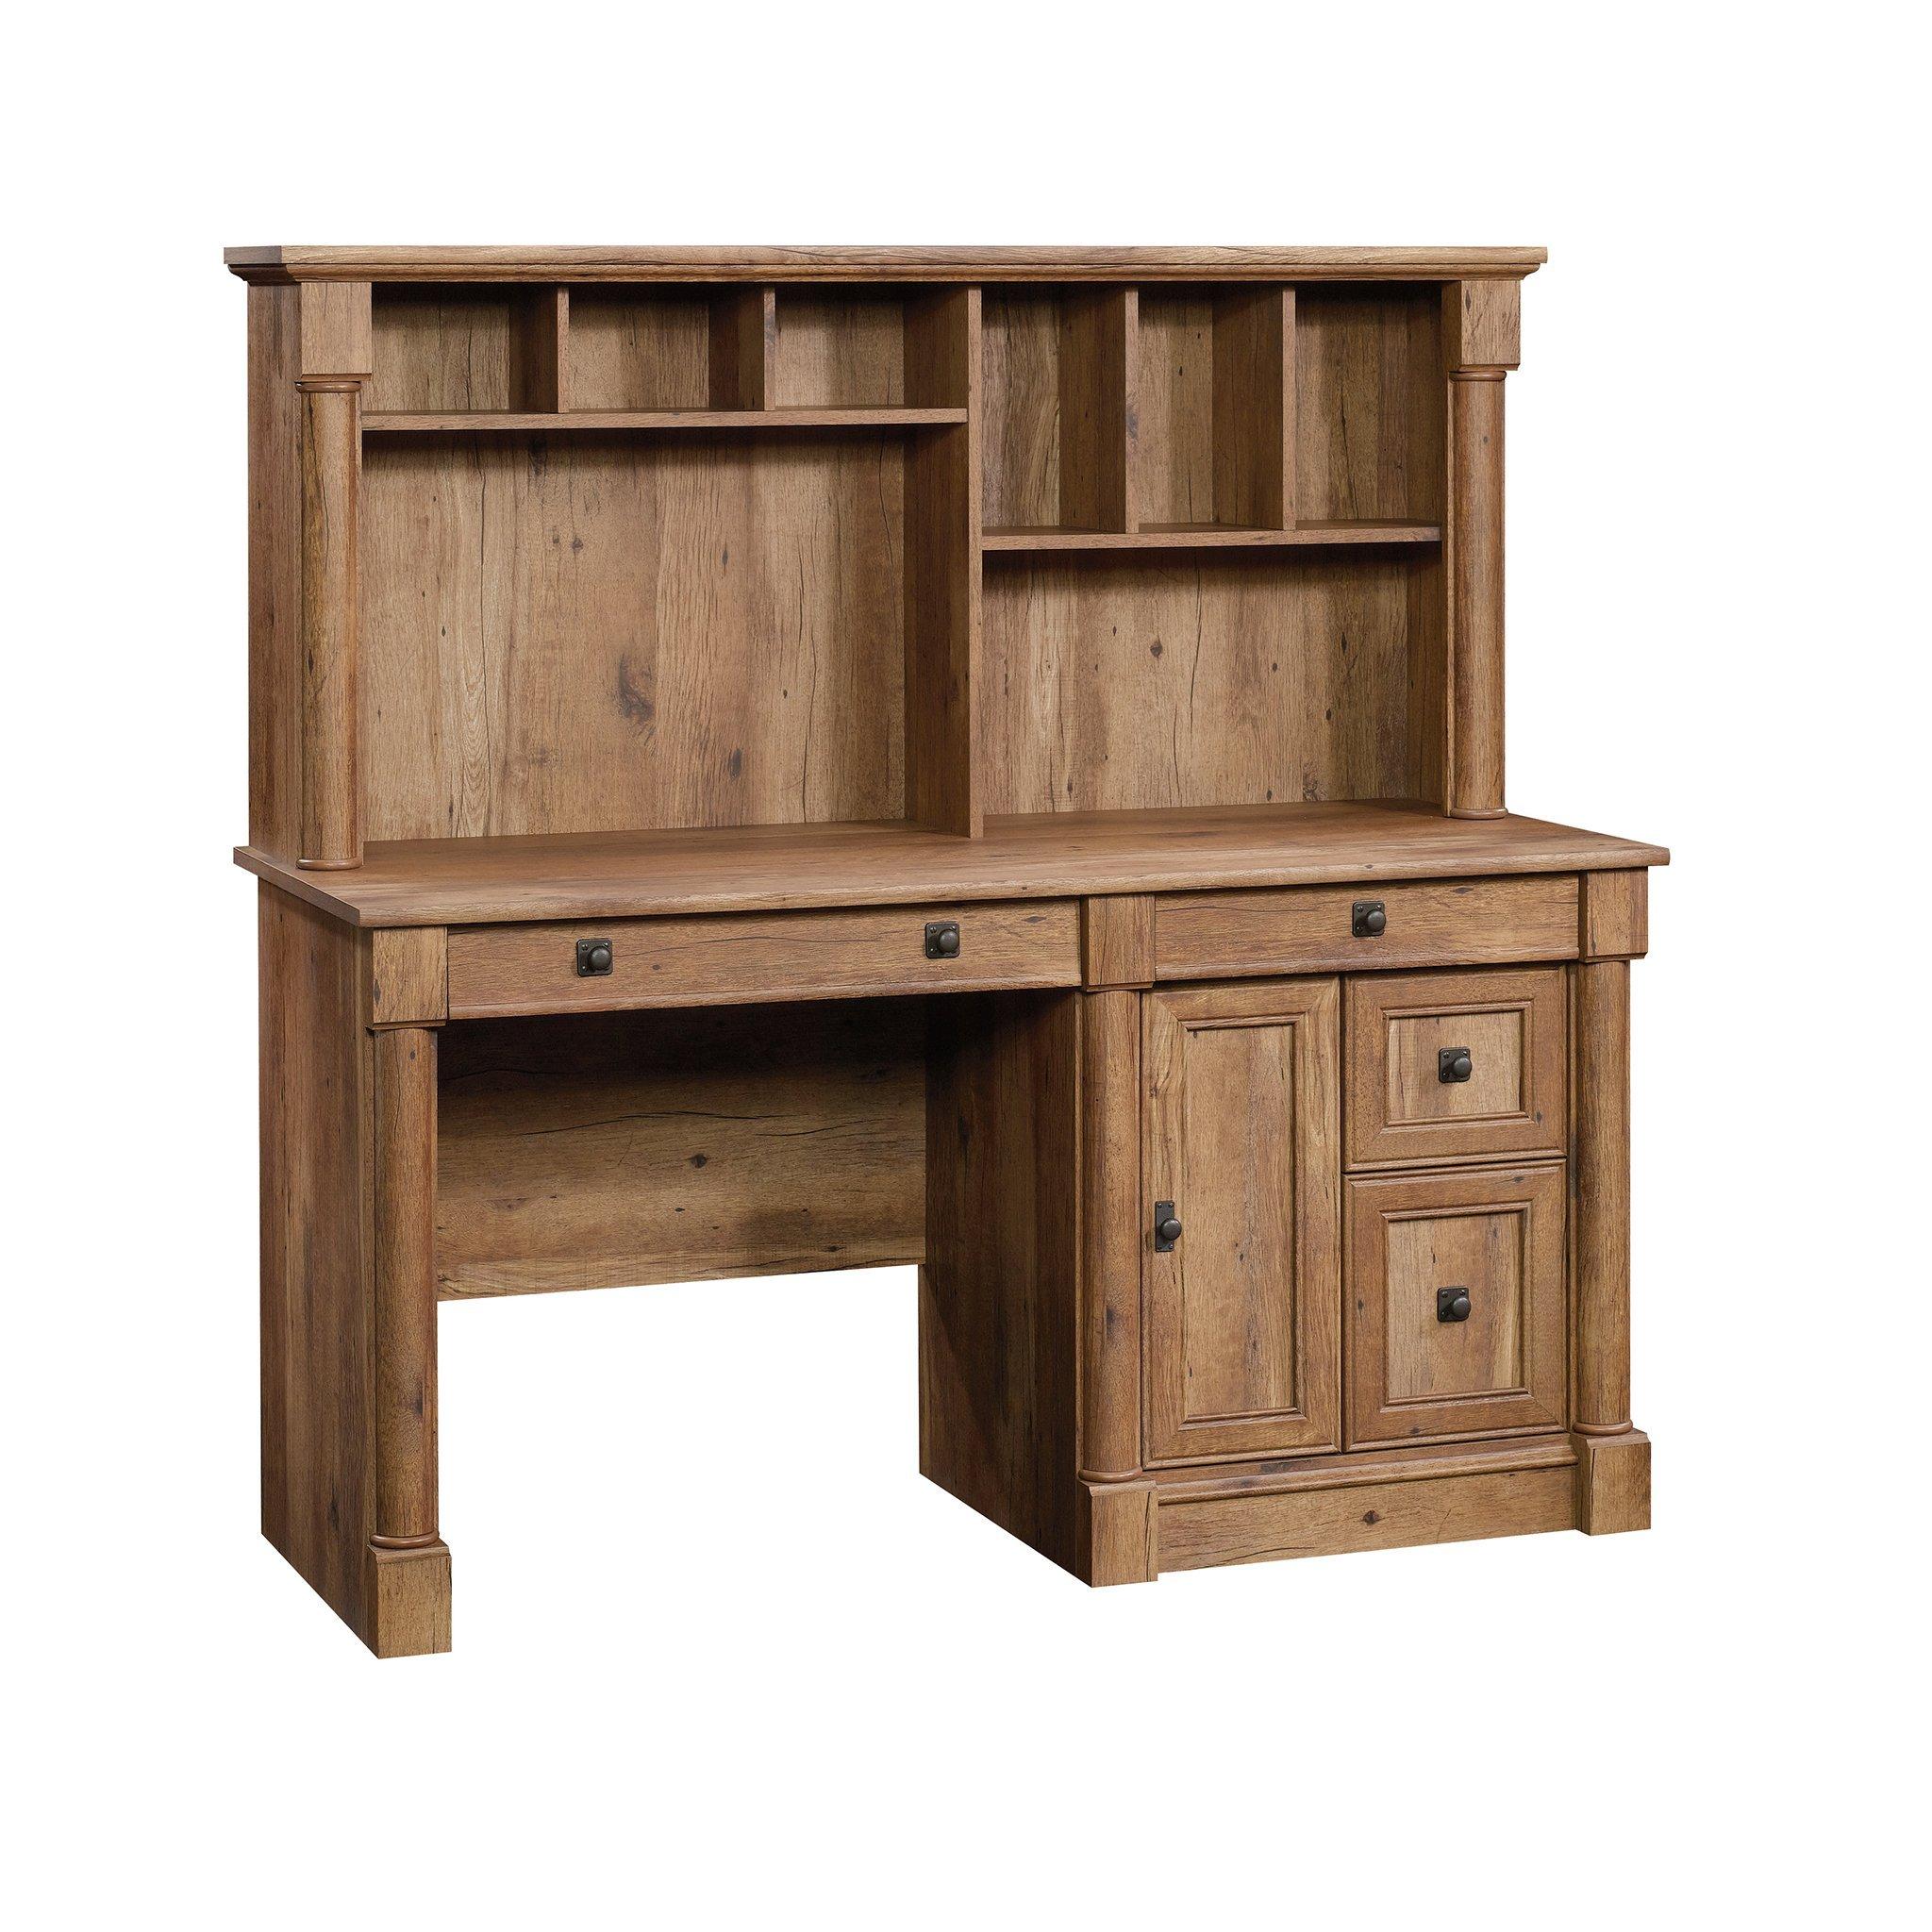 Sauder 420713 Palladia Computer Desk with Hutch, Vintage Oak Finish by Sauder